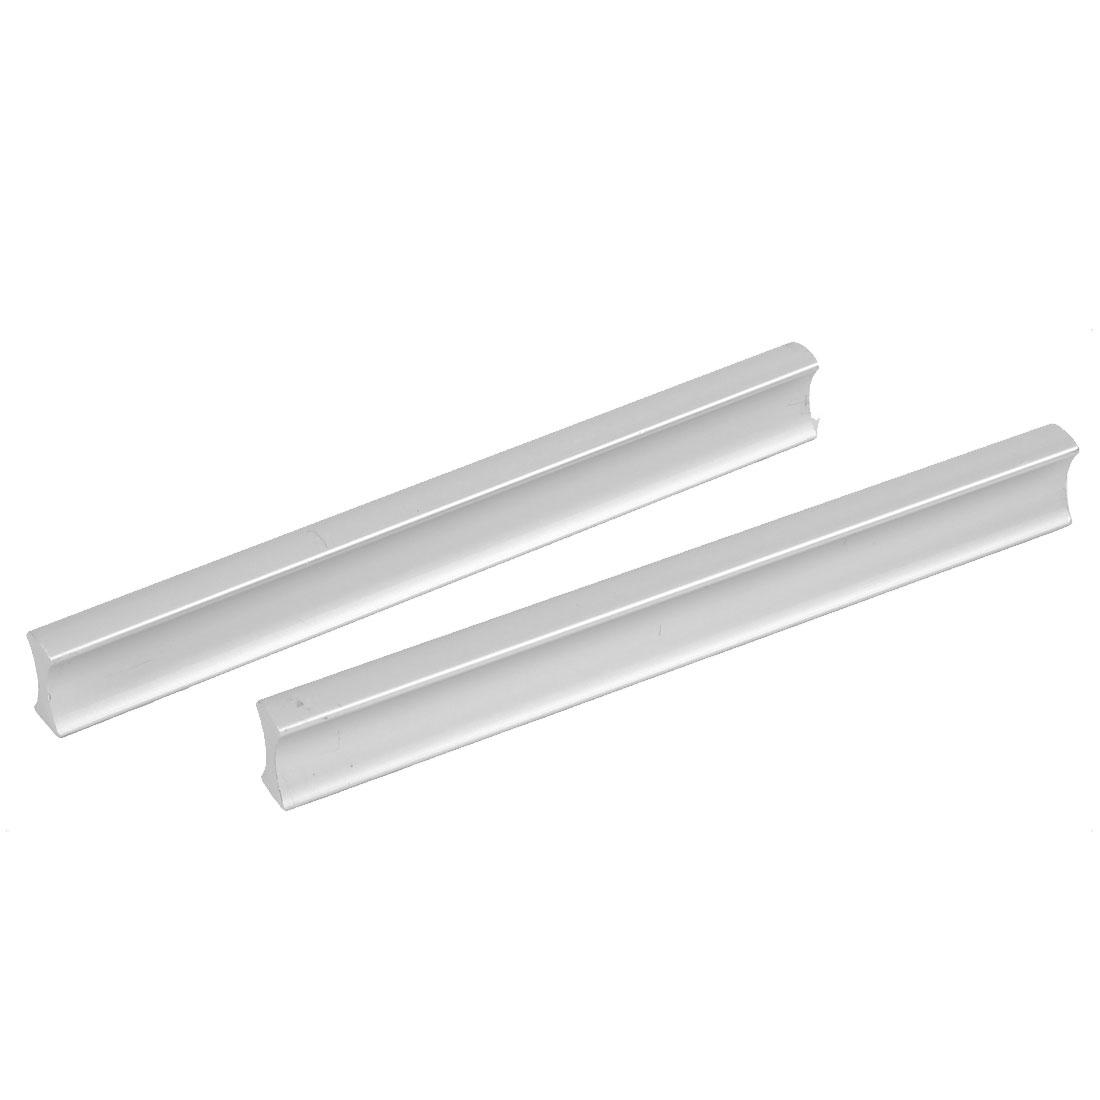 128mm Mount Distance Kitchen Cupboard Dresser Rectangular Pull Handle Silver Tone 2pcs